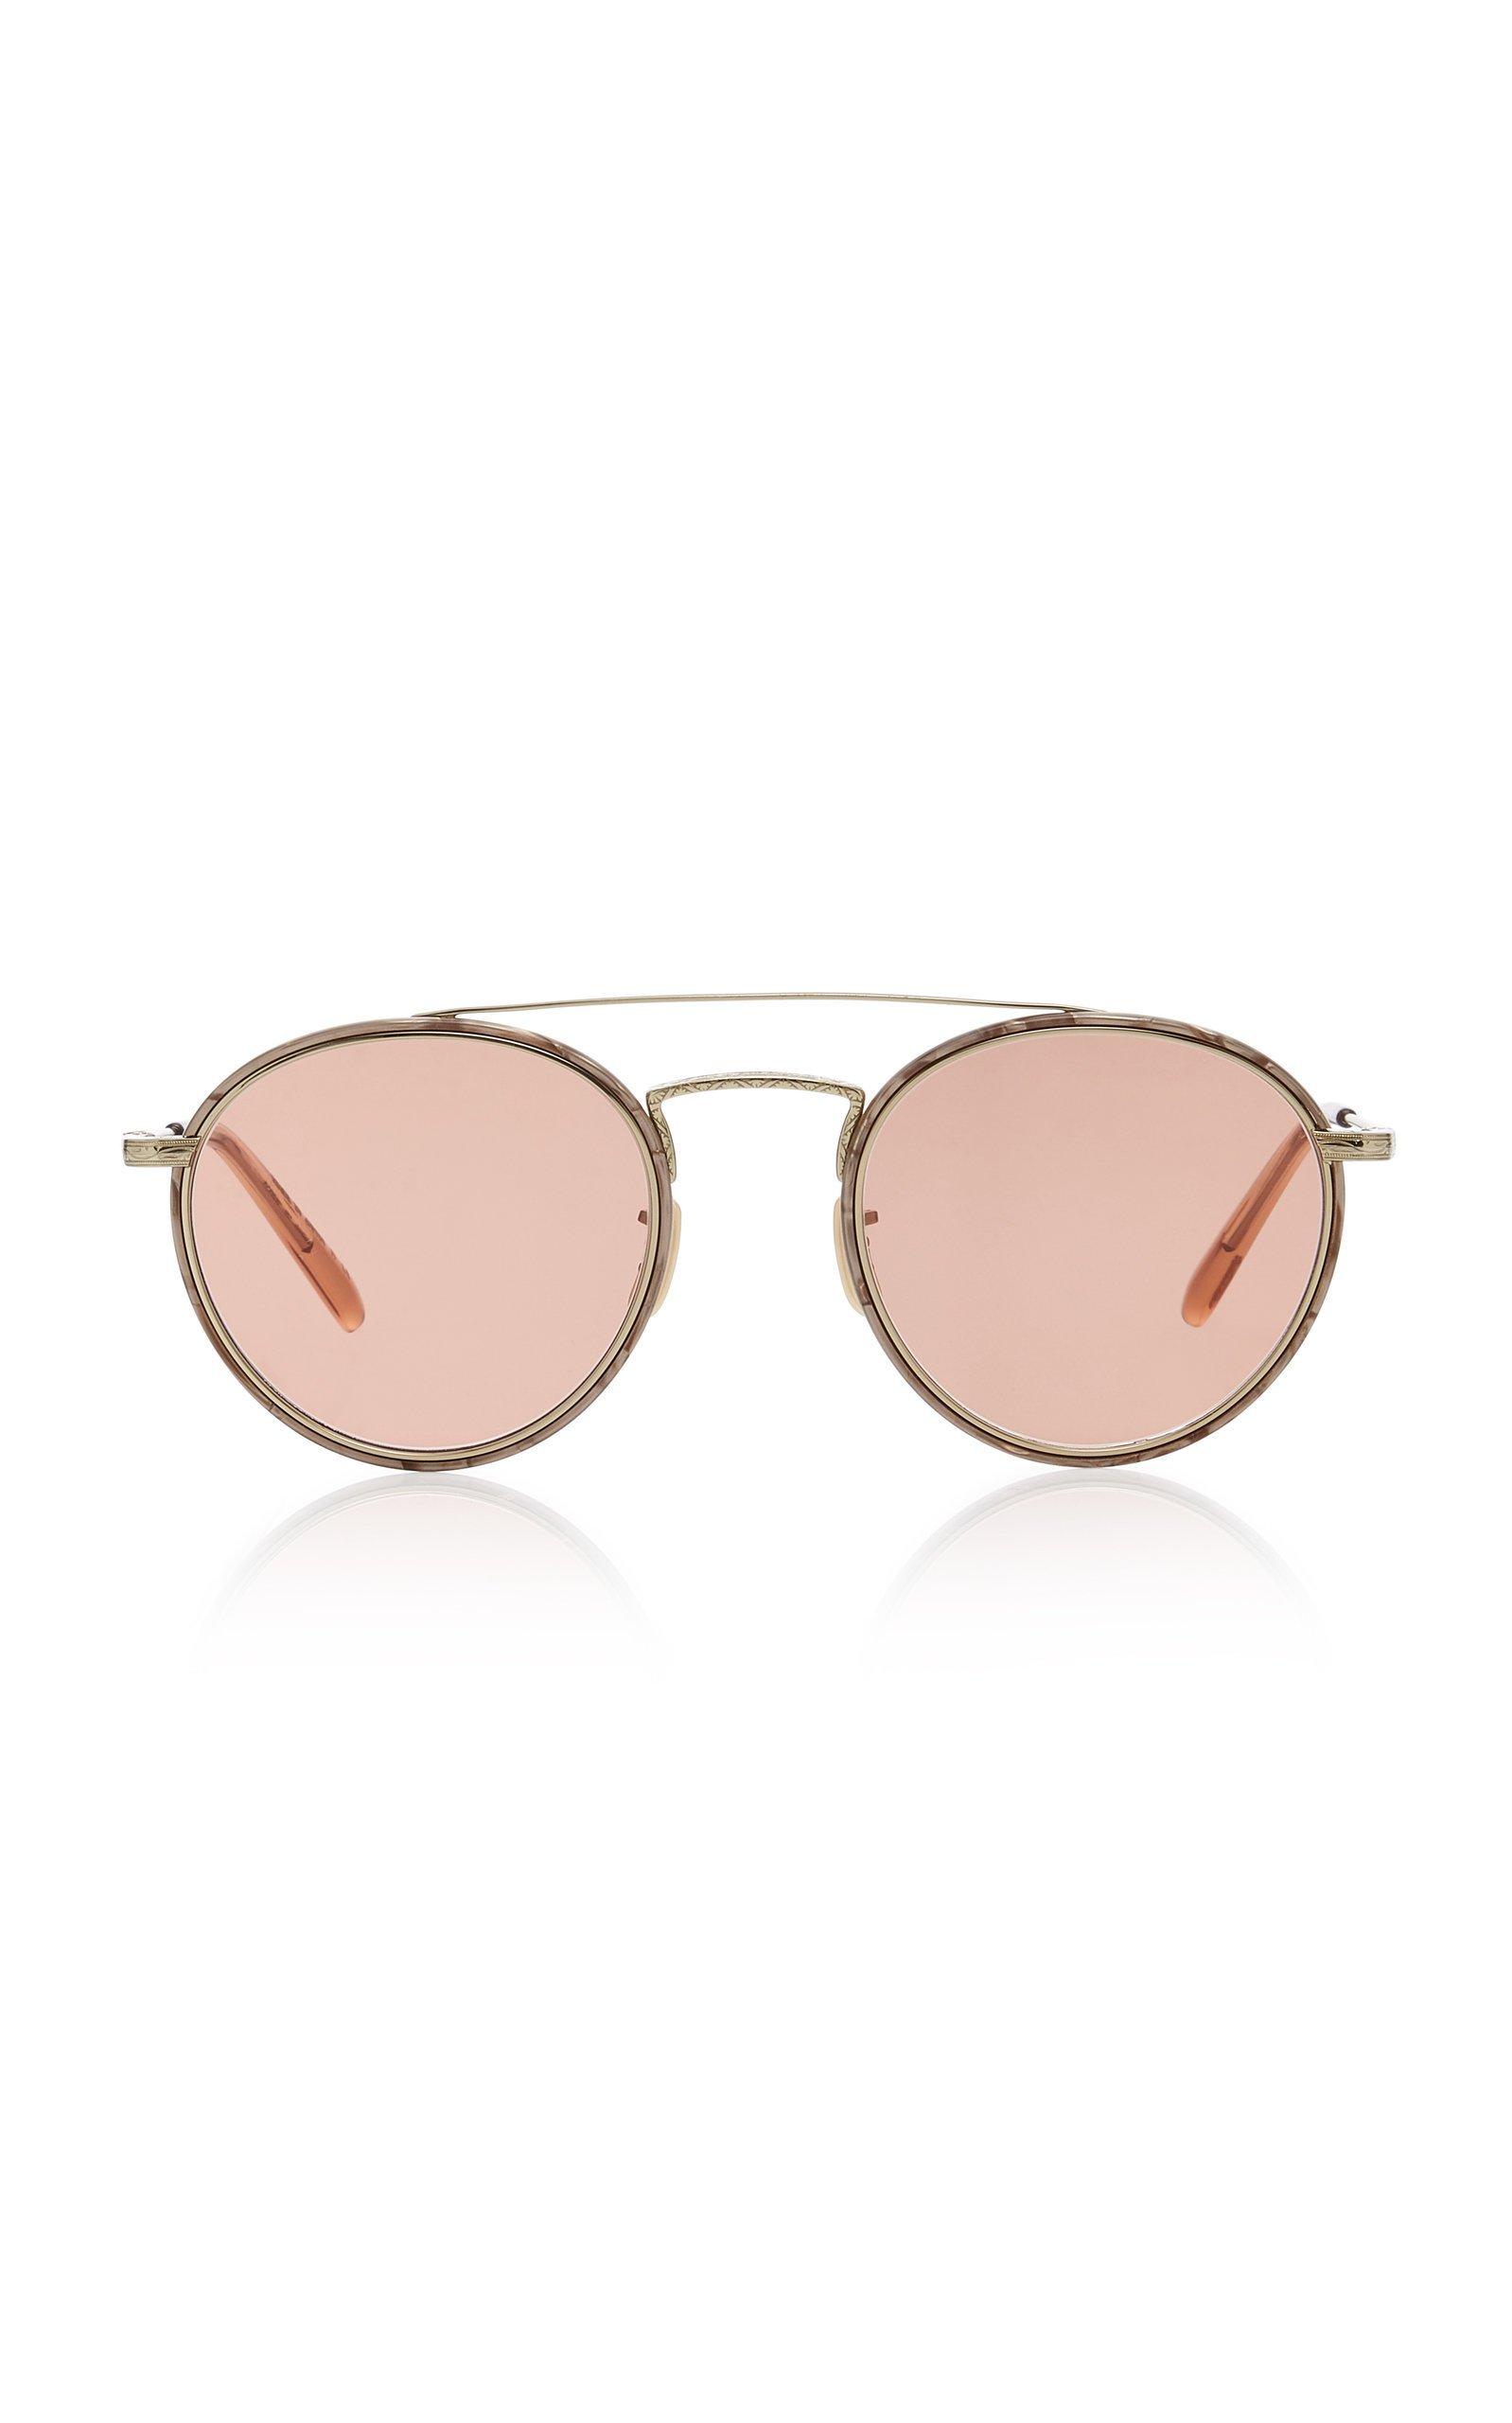 Oliver Peoples Ellice Round-Frame Metal Sunglasses